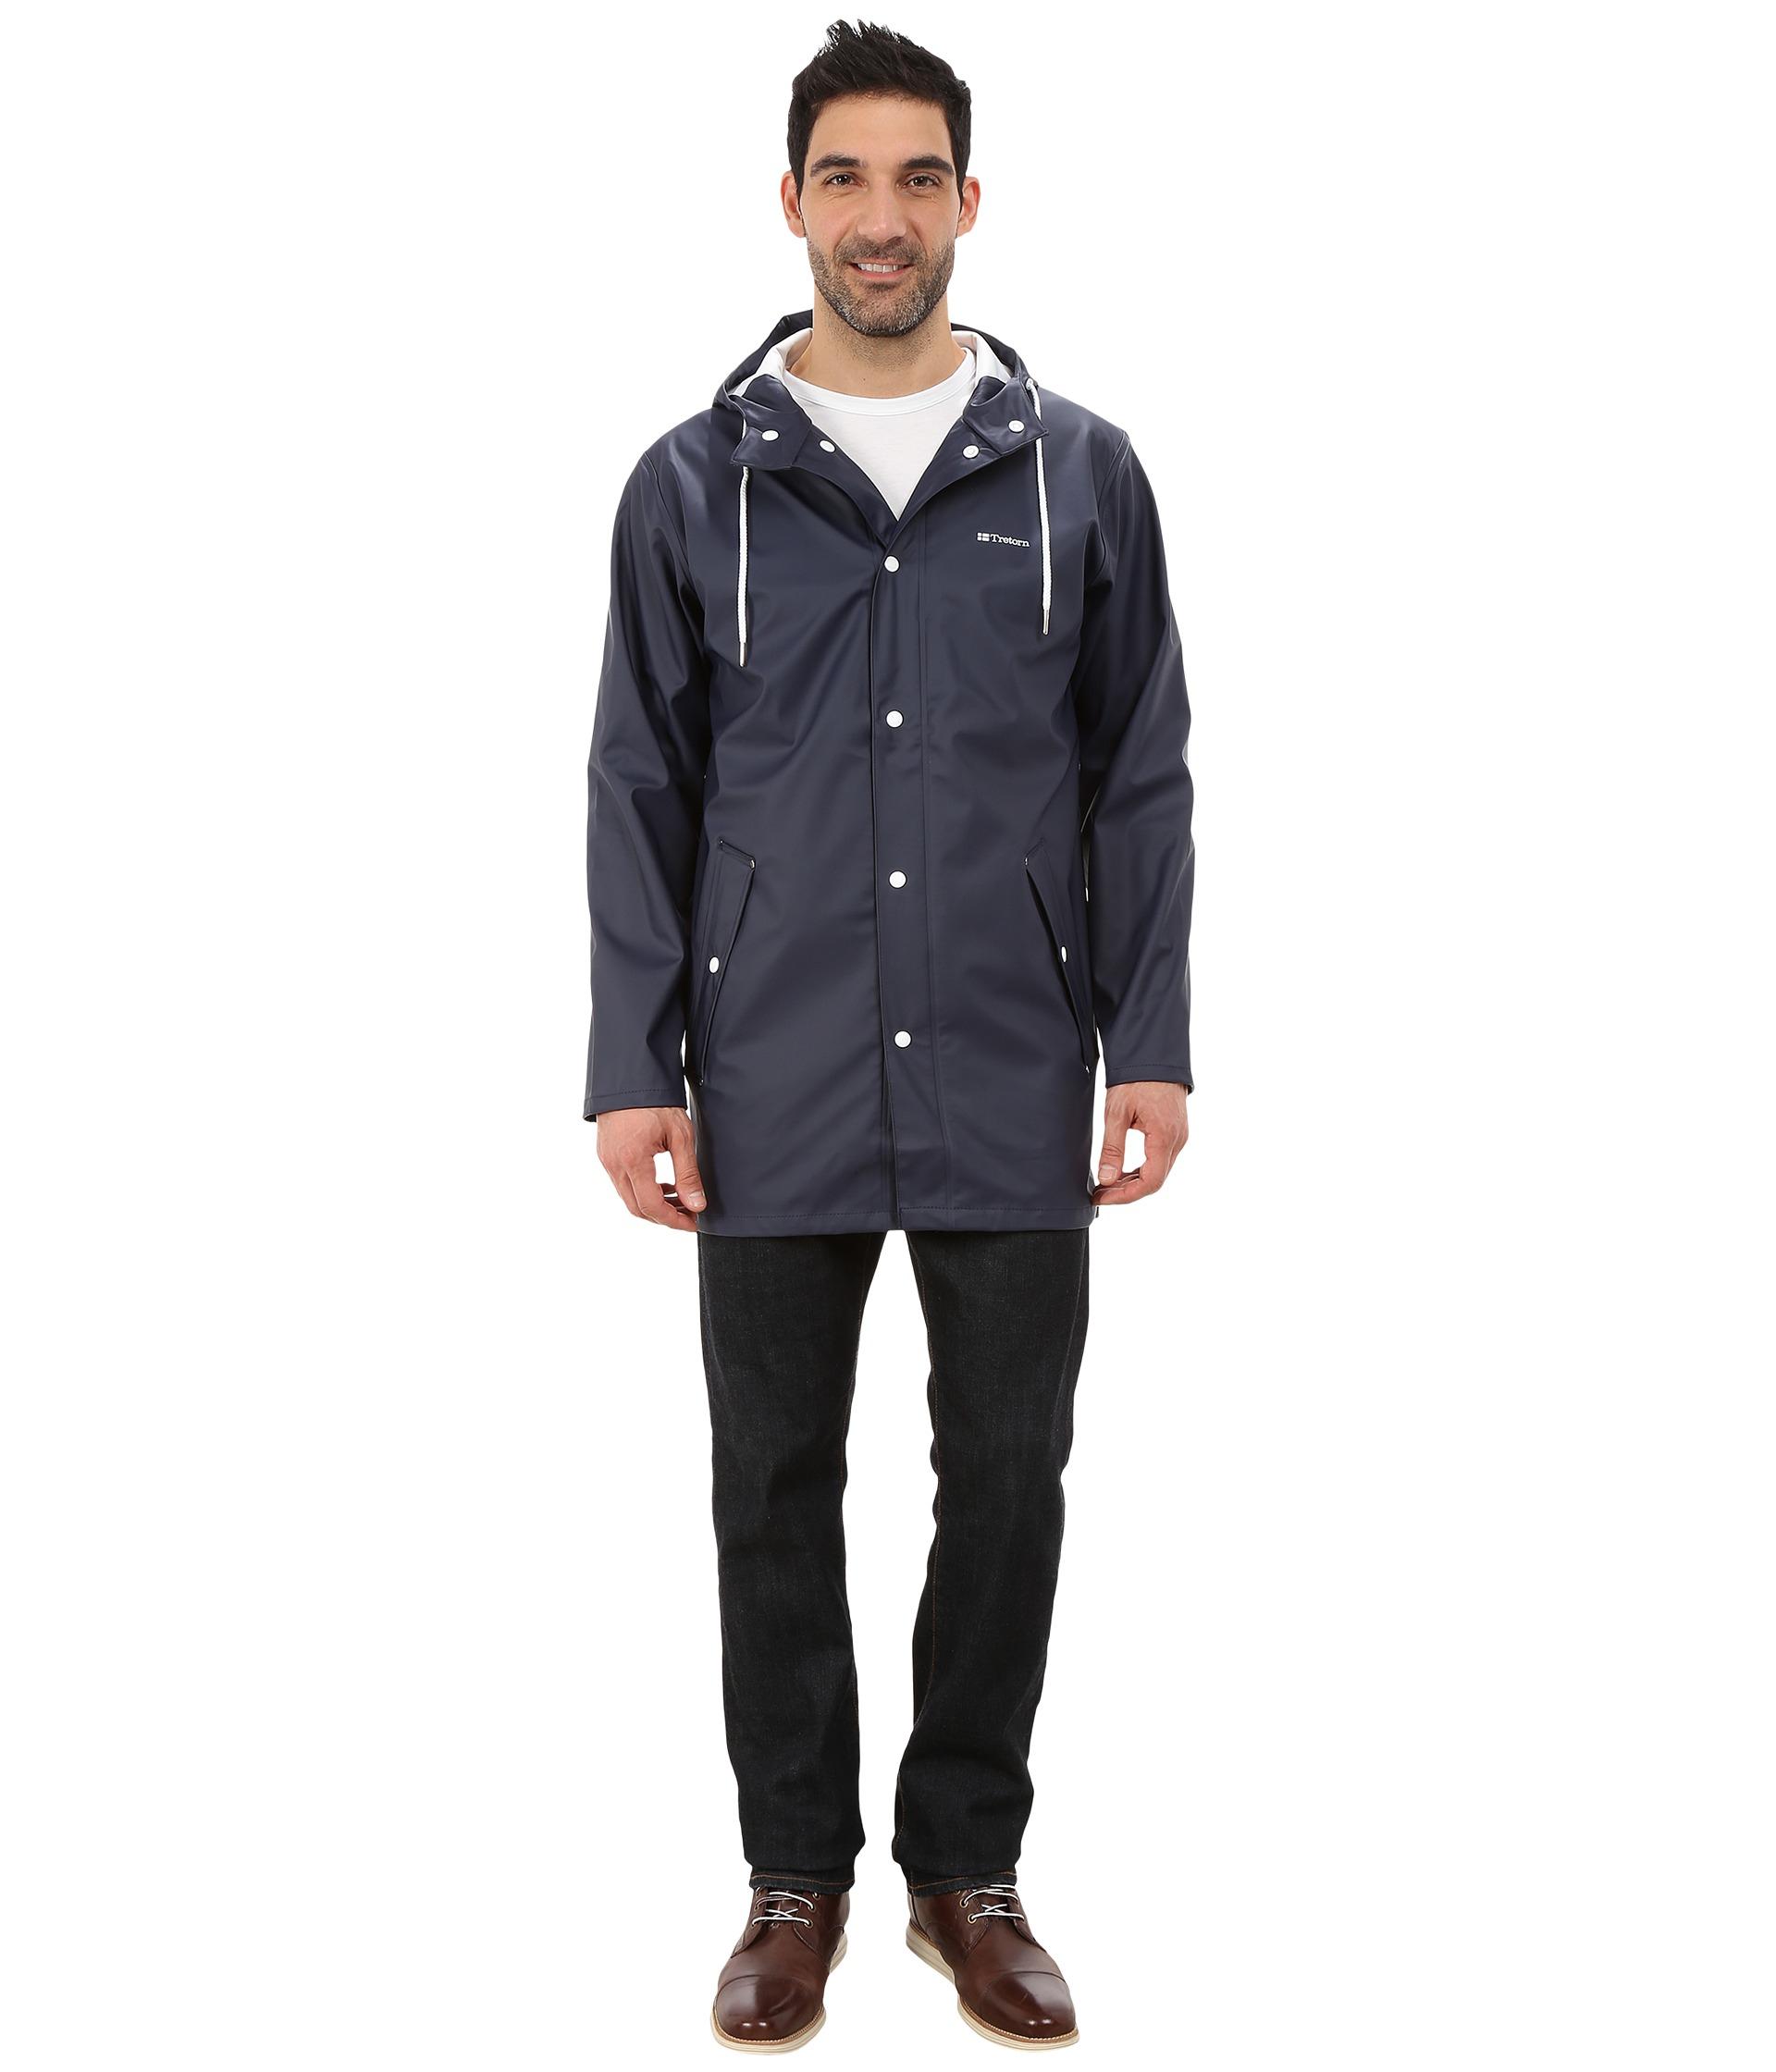 fef3a755b tretorn-navy-wings-rain-jacket-blue-product-2-783807574-normal.jpeg